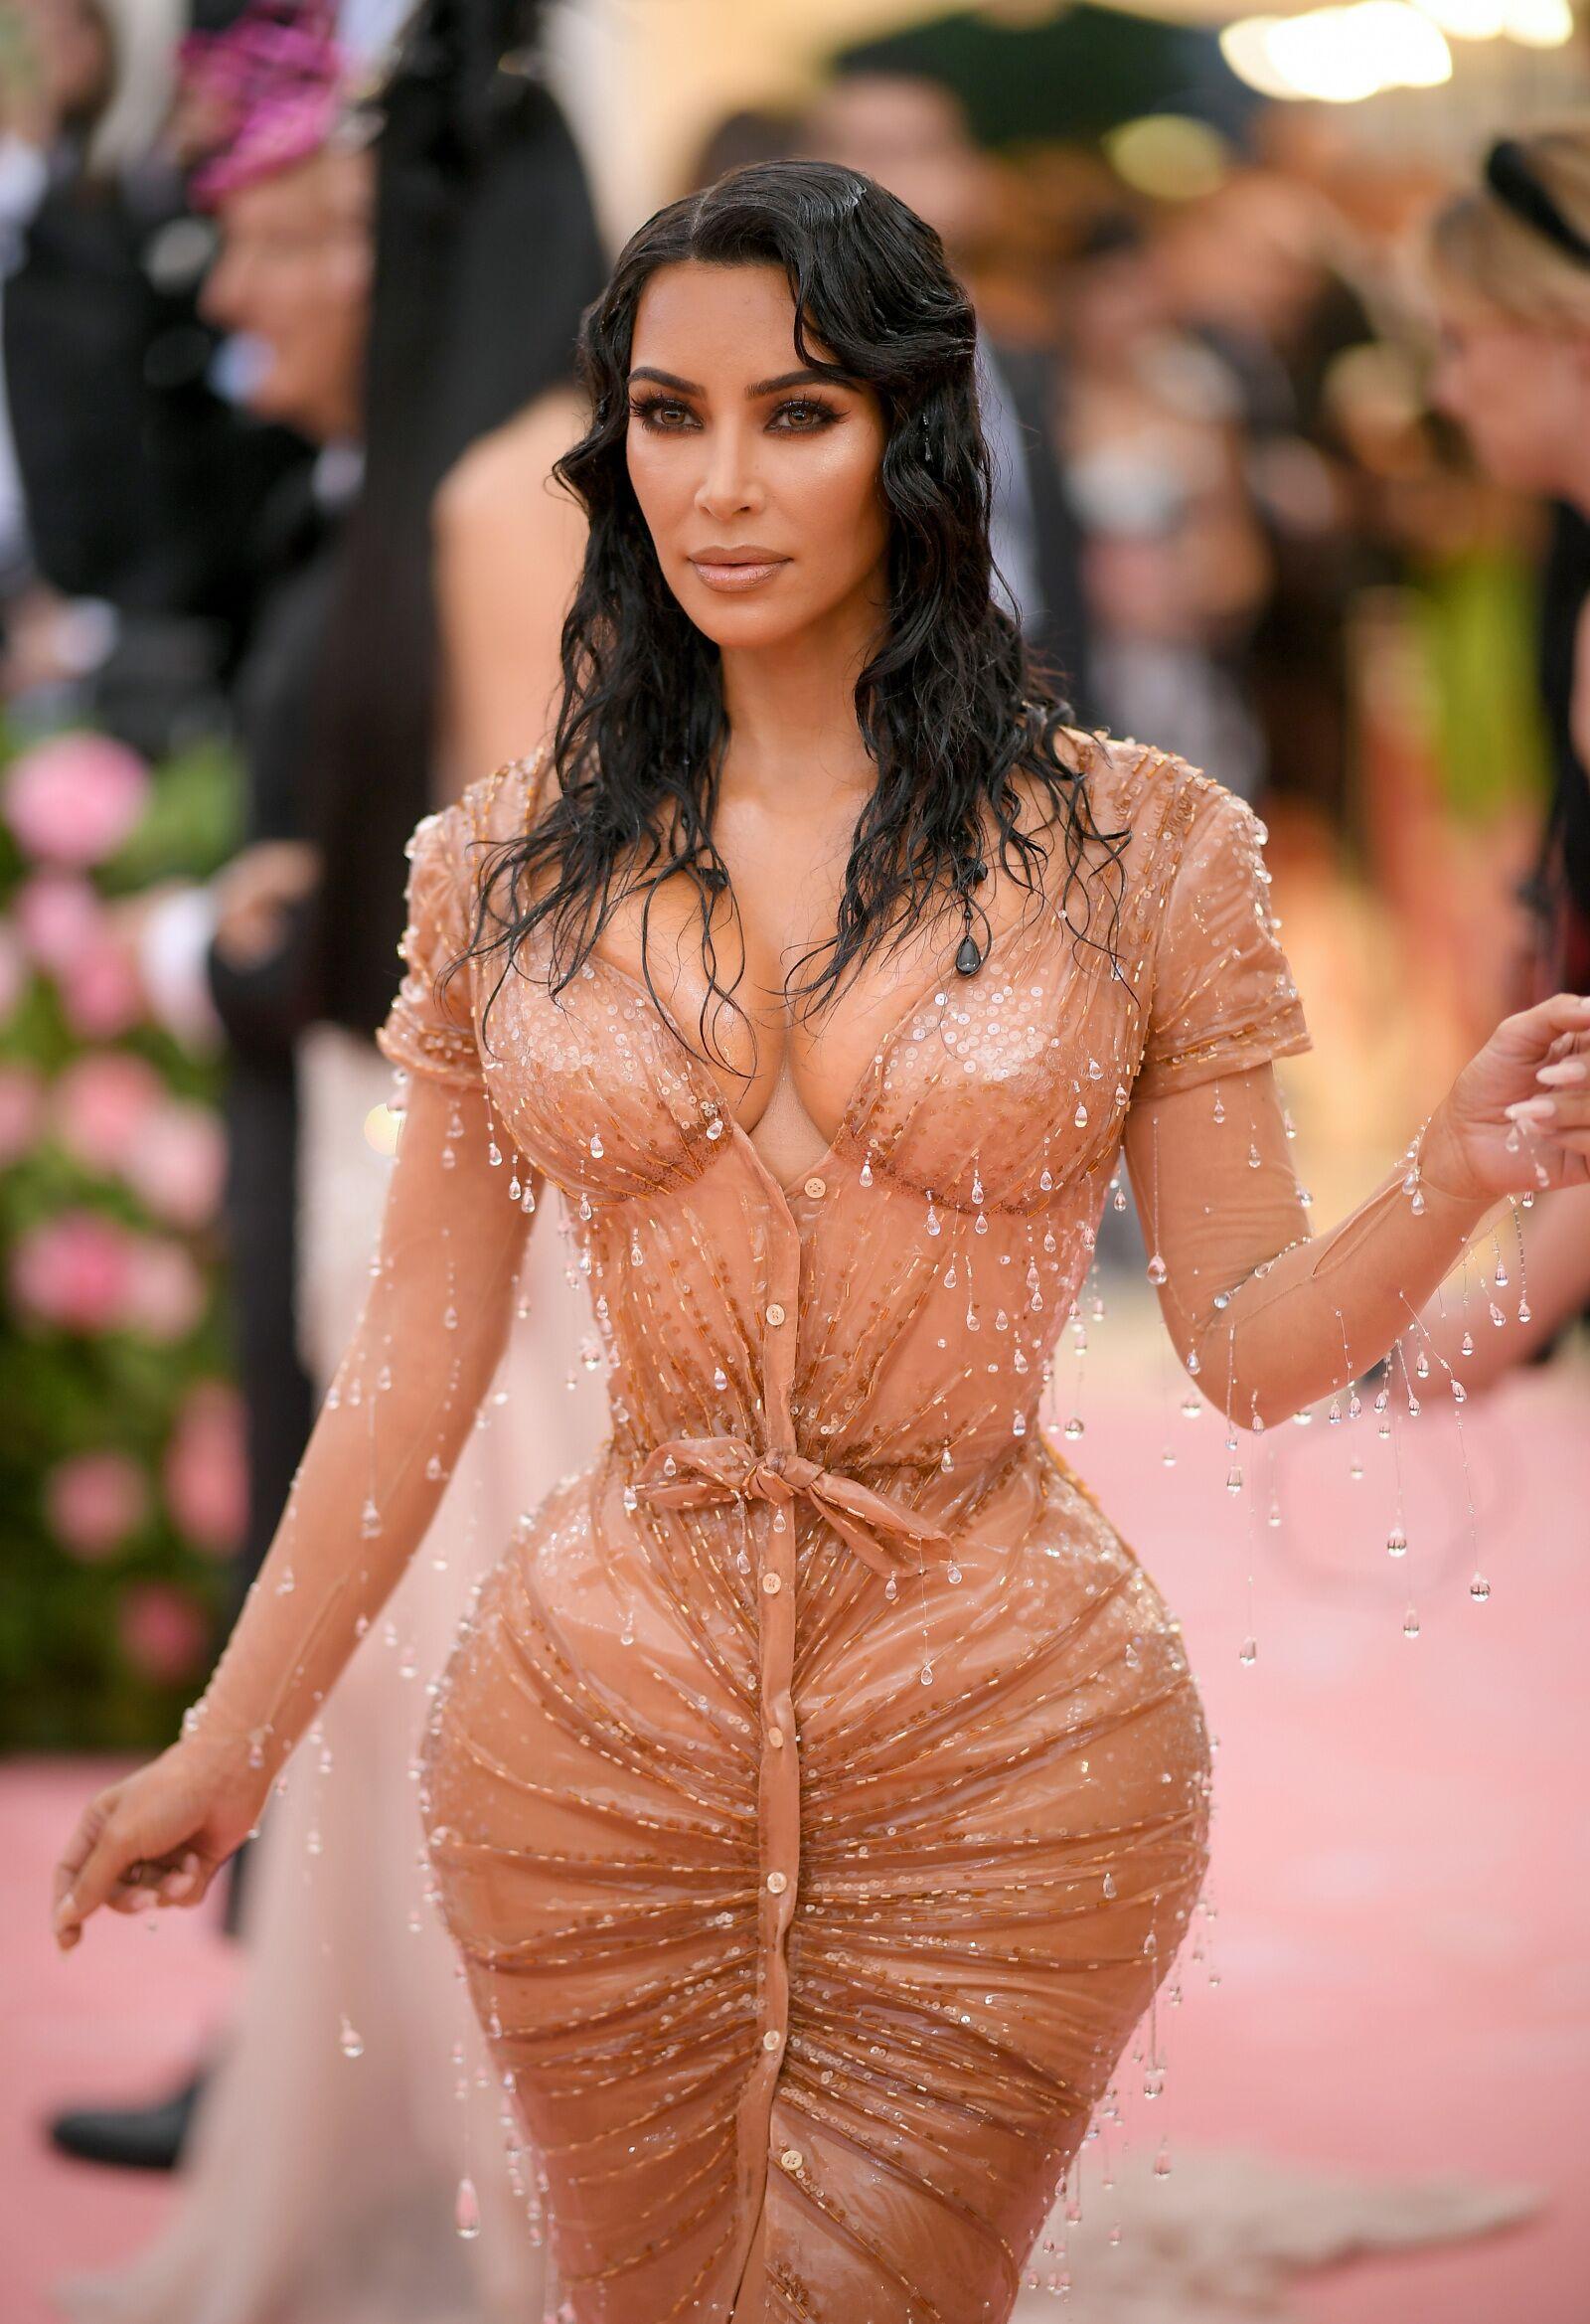 Kim Kardashian poses nearly nude for new glam shades